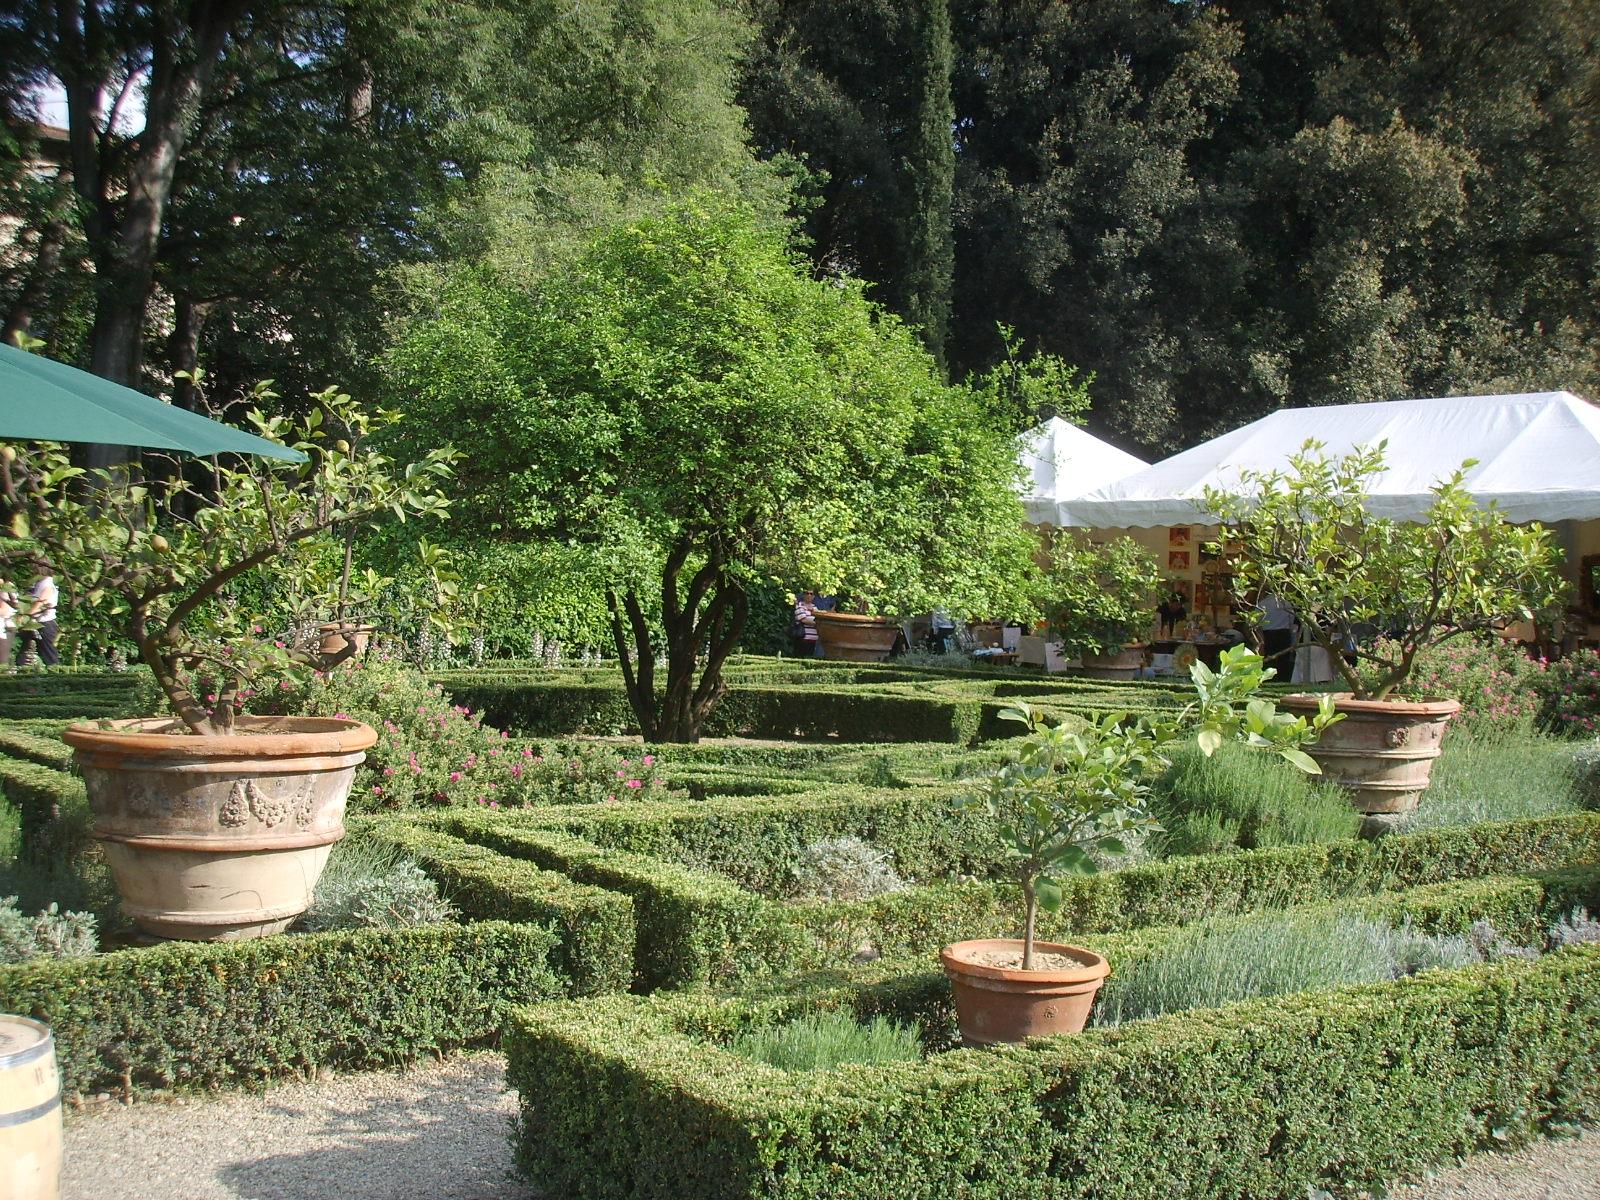 Gallery of corsini aiuole jpg with aiuole giardino immagini for Aiuole giardino idee